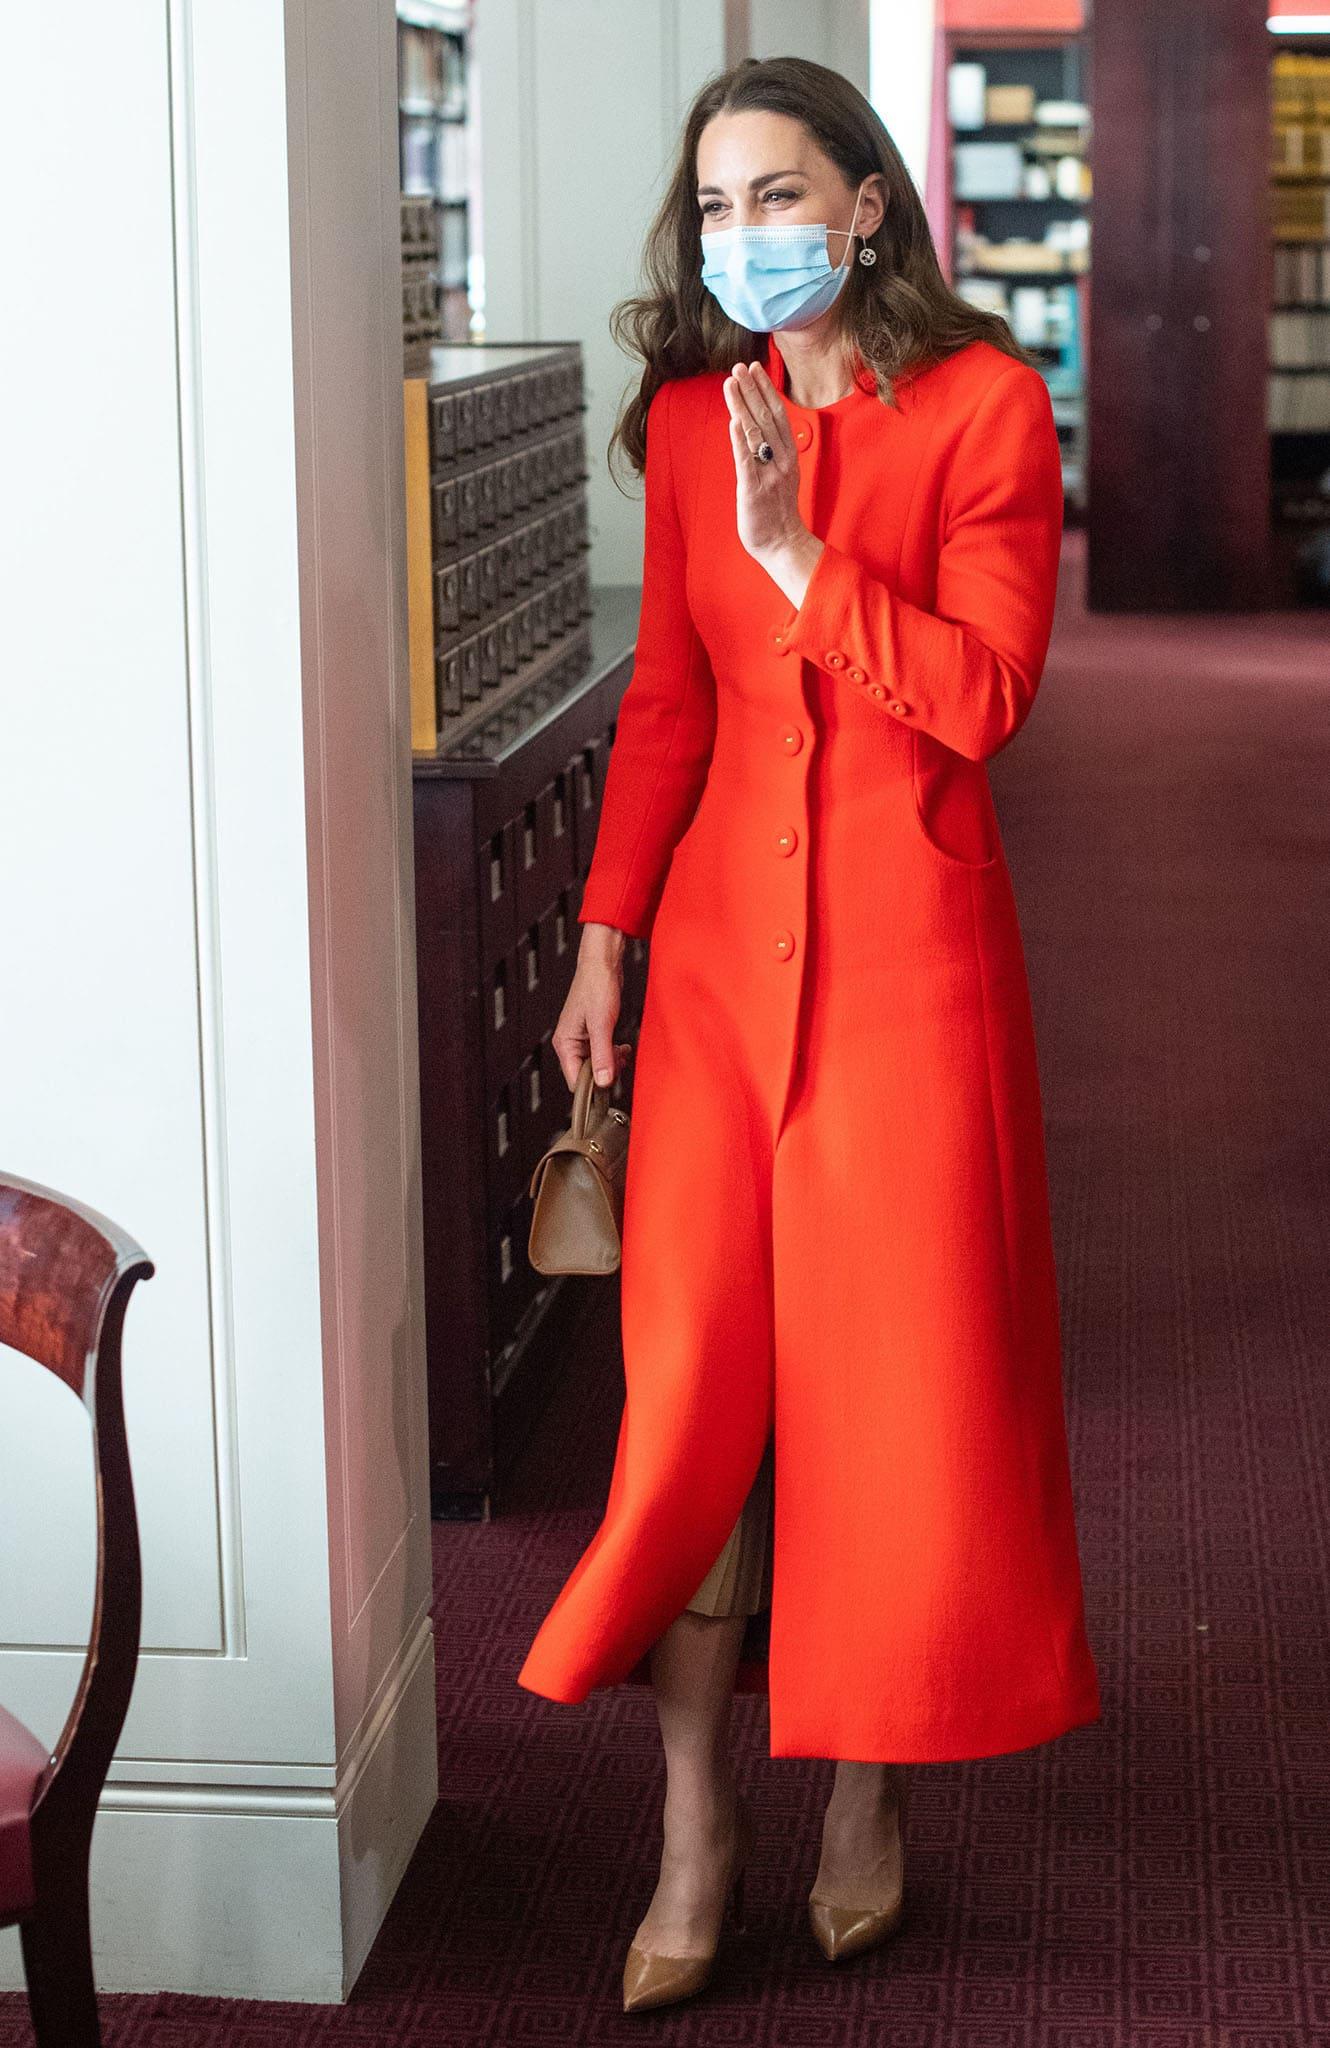 Kate Middleton cuts an elegant figure in Eponine red wool coat and Zara nude midi skirt